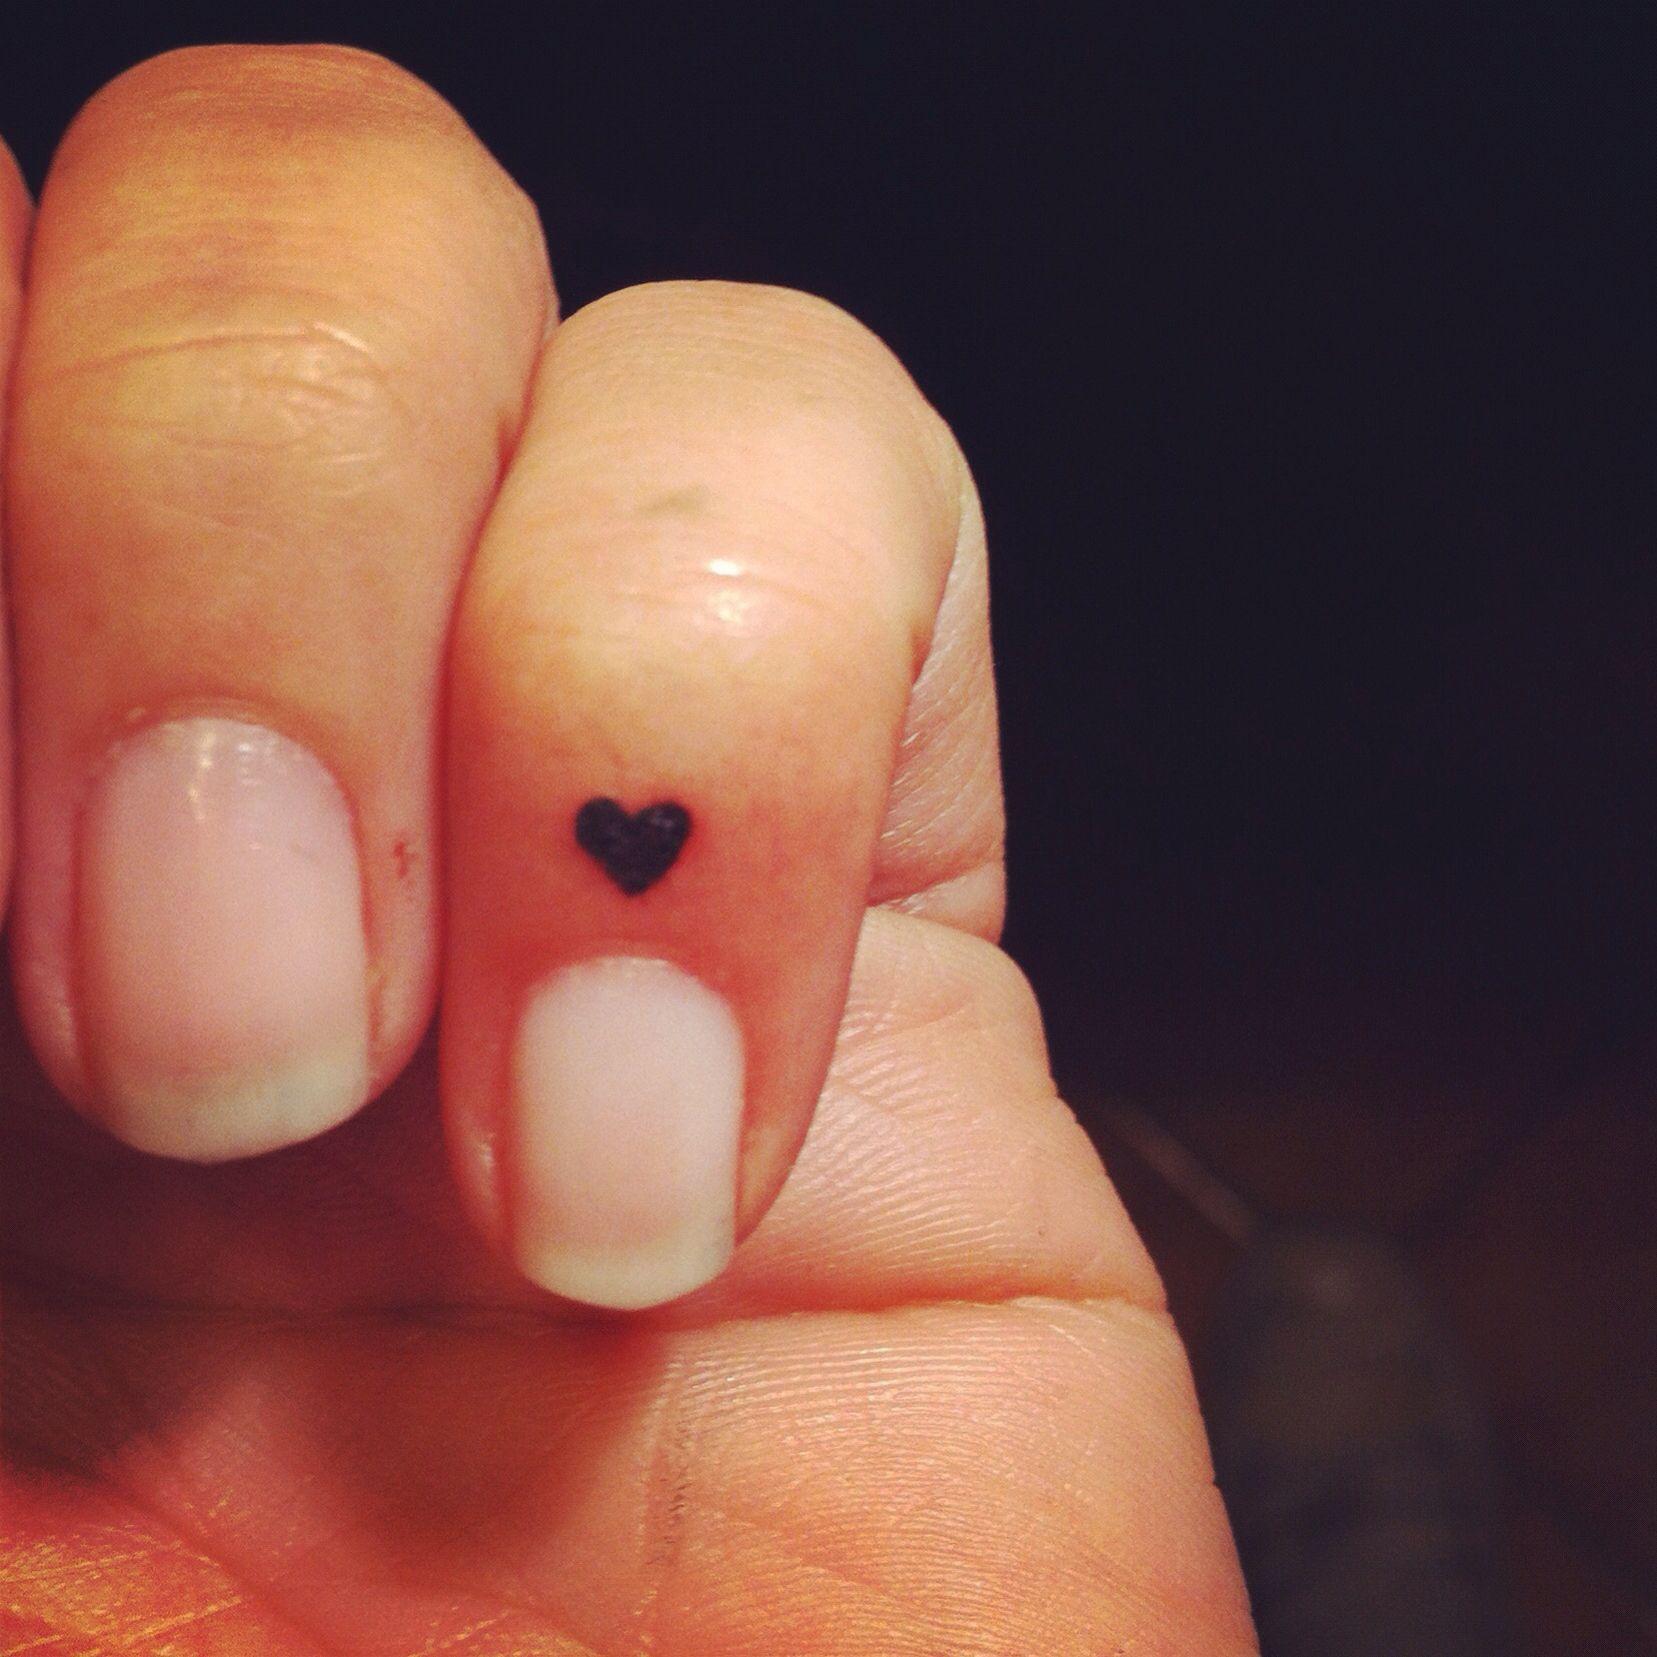 Micro heart Tattoo.. Sooooo cute! My WorkS ® Pinterest